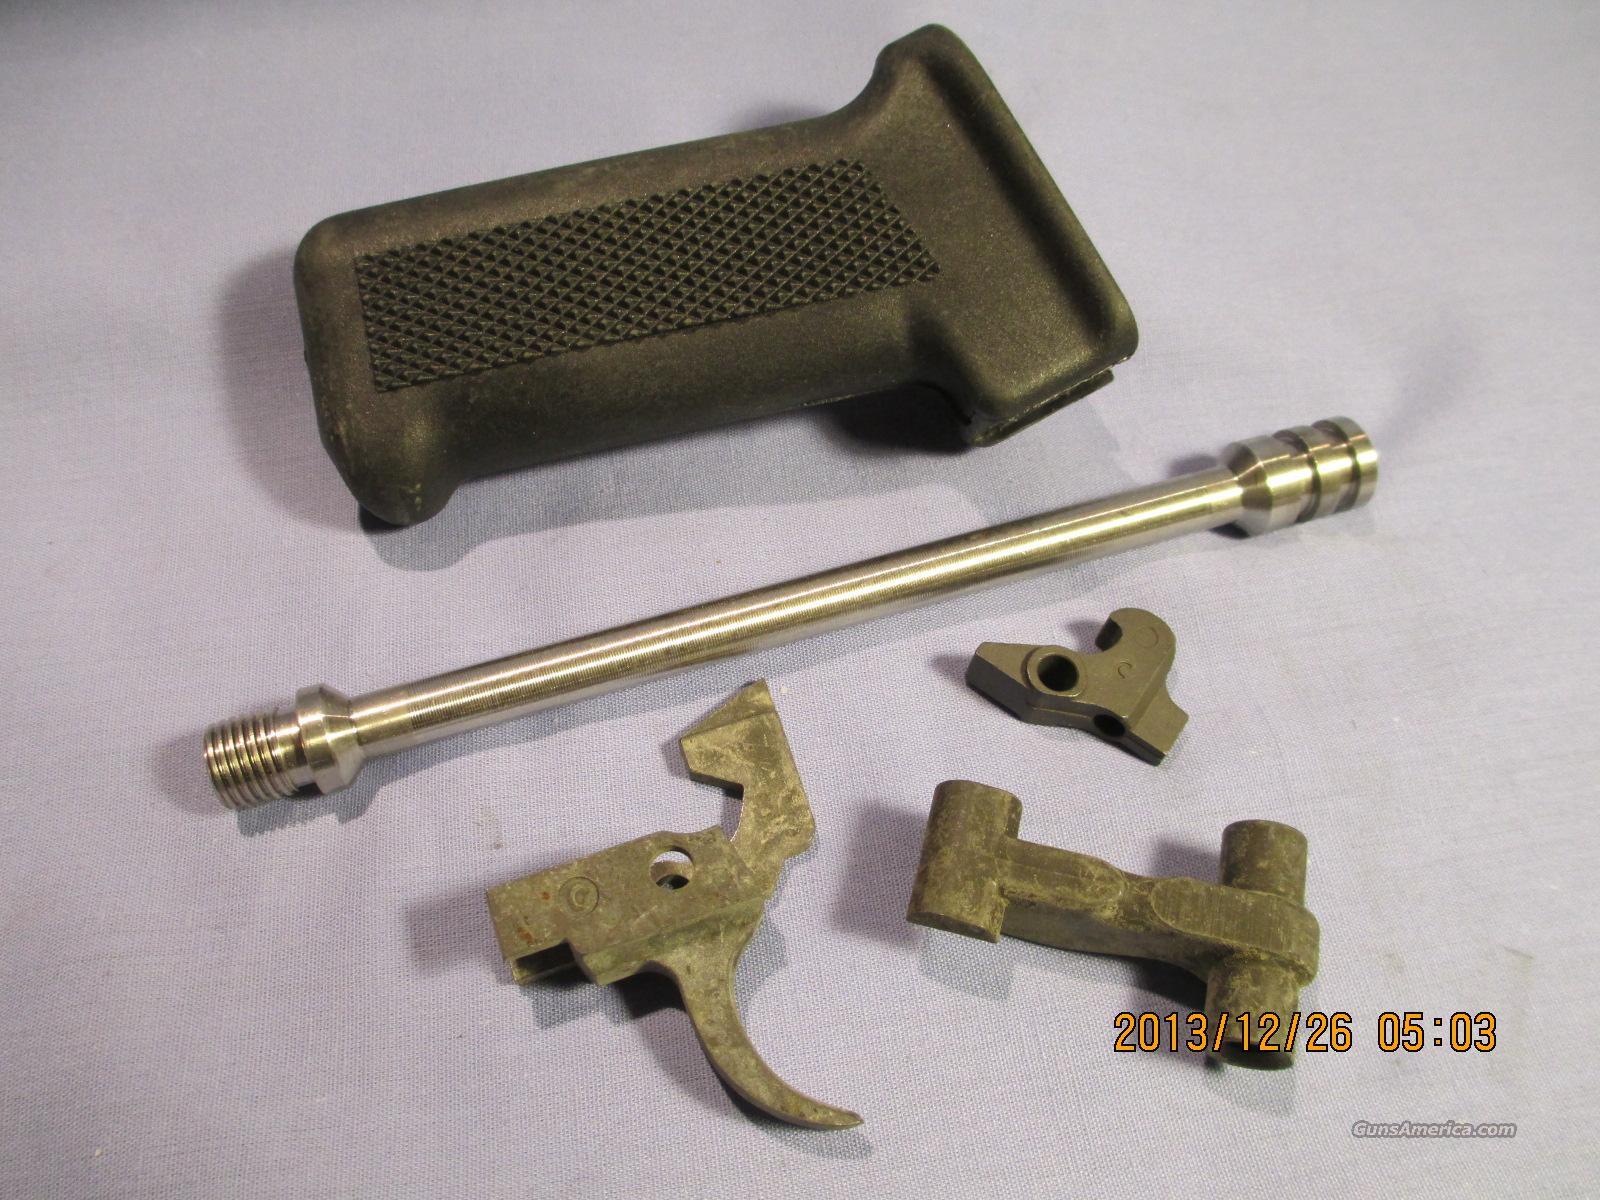 AK47 US MFG. PARTS....922R COMPLIANCE 3 PART SET  Non-Guns > Gun Parts > Military - Foreign